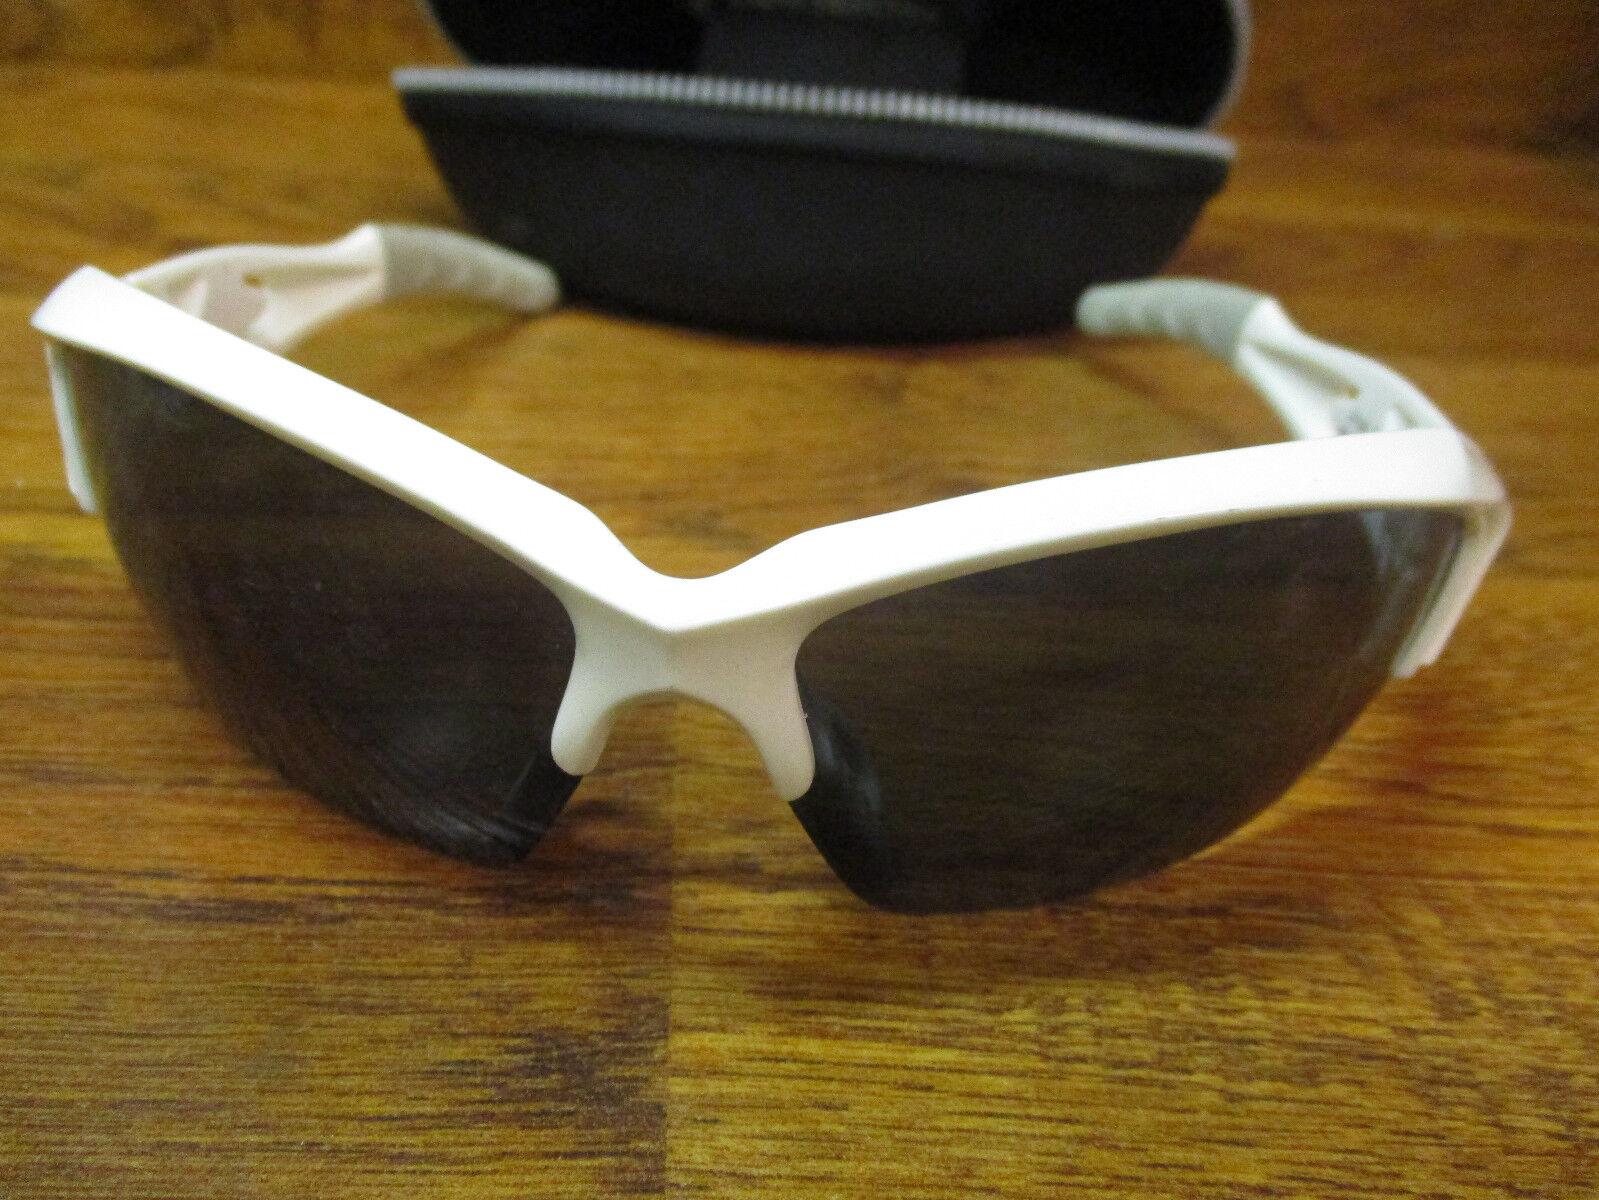 ENDURA GUPPY WHITE PHOTOCHROMIC CYCLING SUN GLASSES & HARD CASE